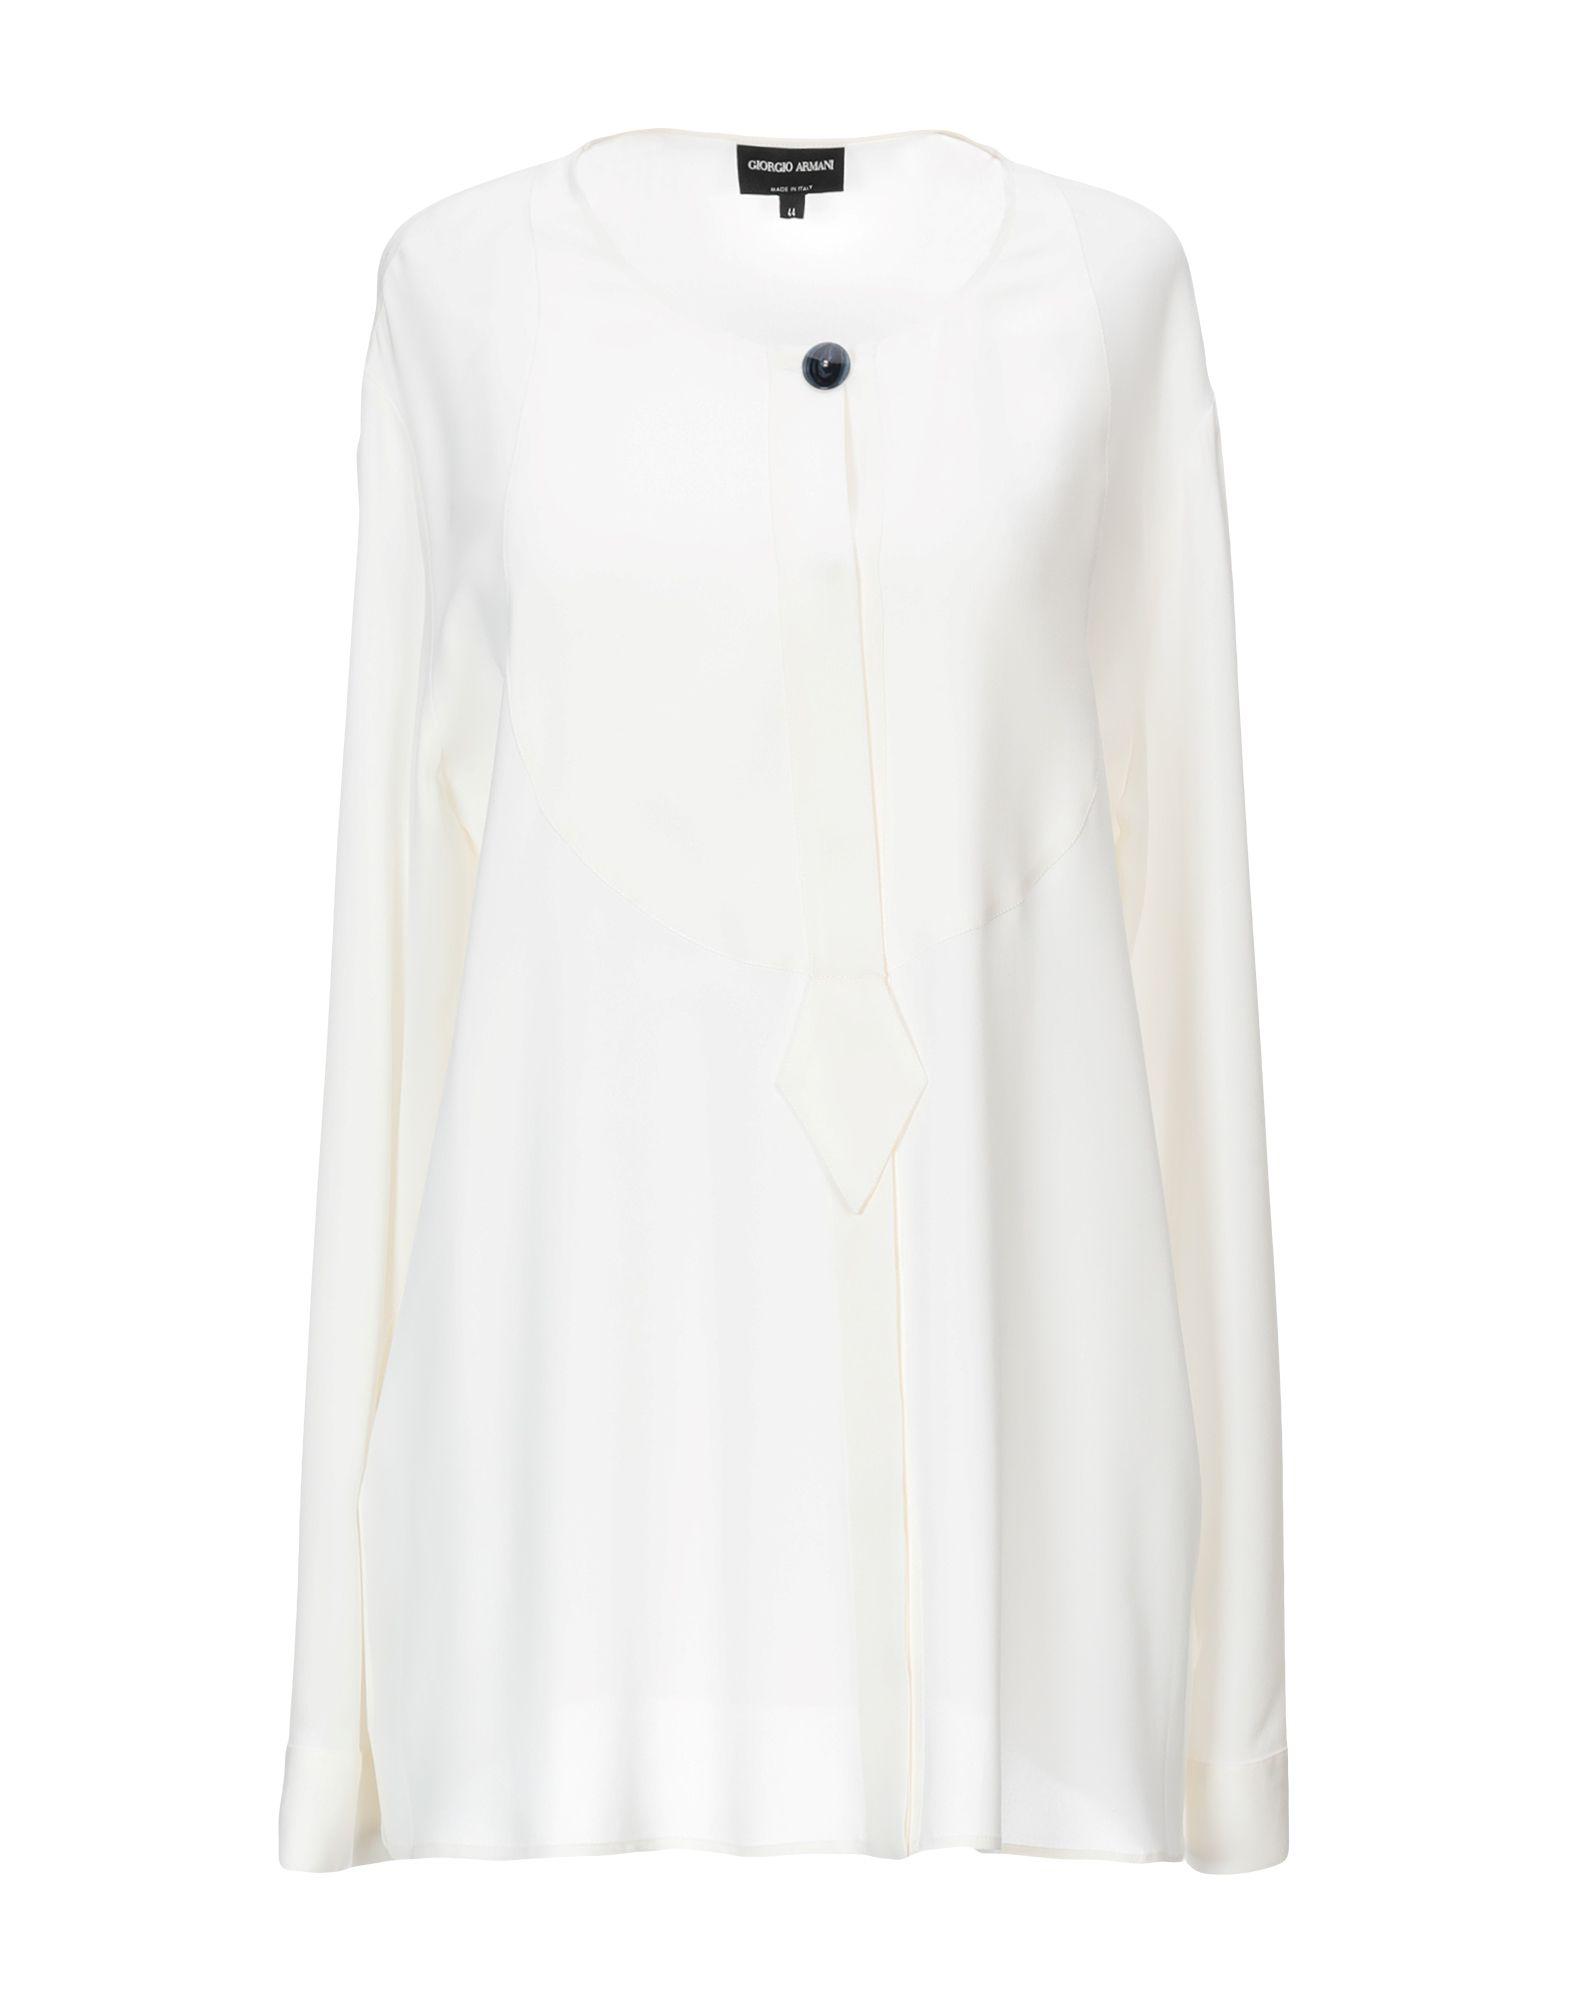 521c3027cb giorgio armani shirts tops for women - Buy best women's giorgio ...